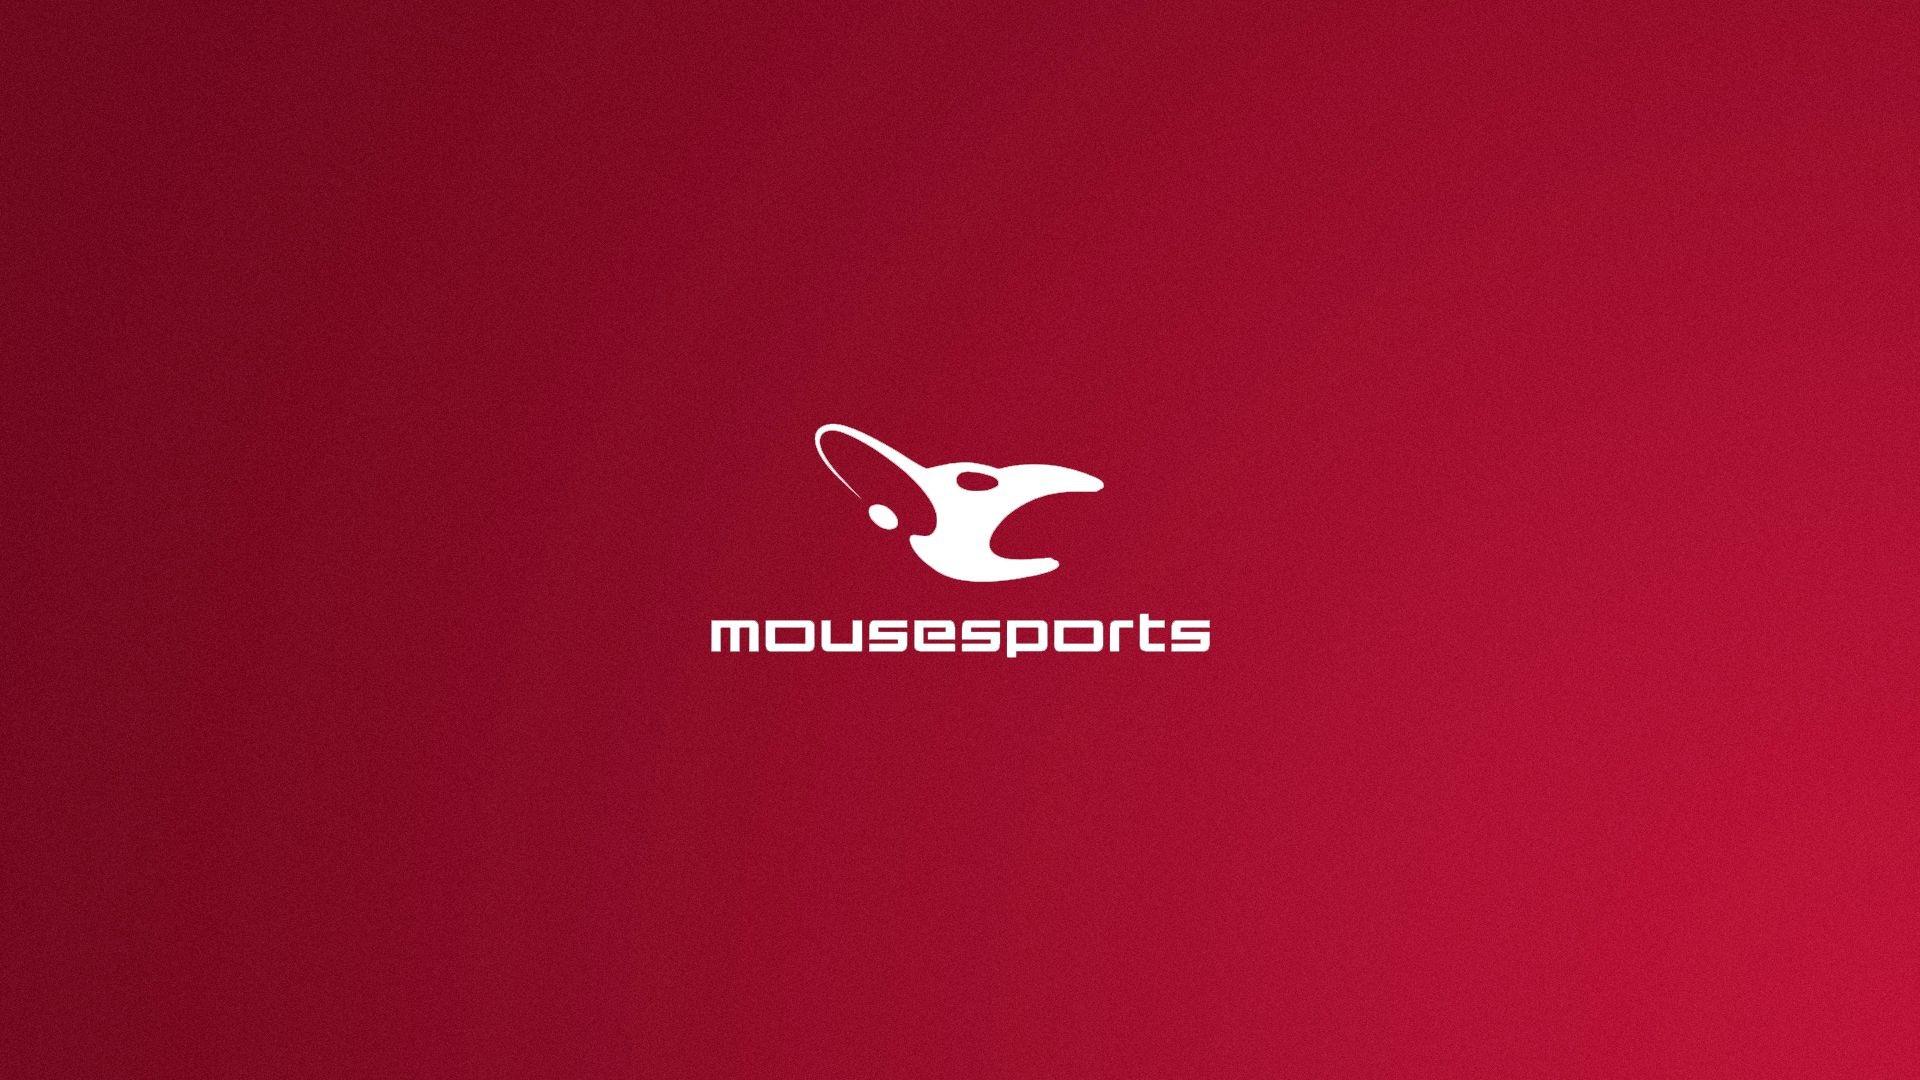 mousesports Wallpaper